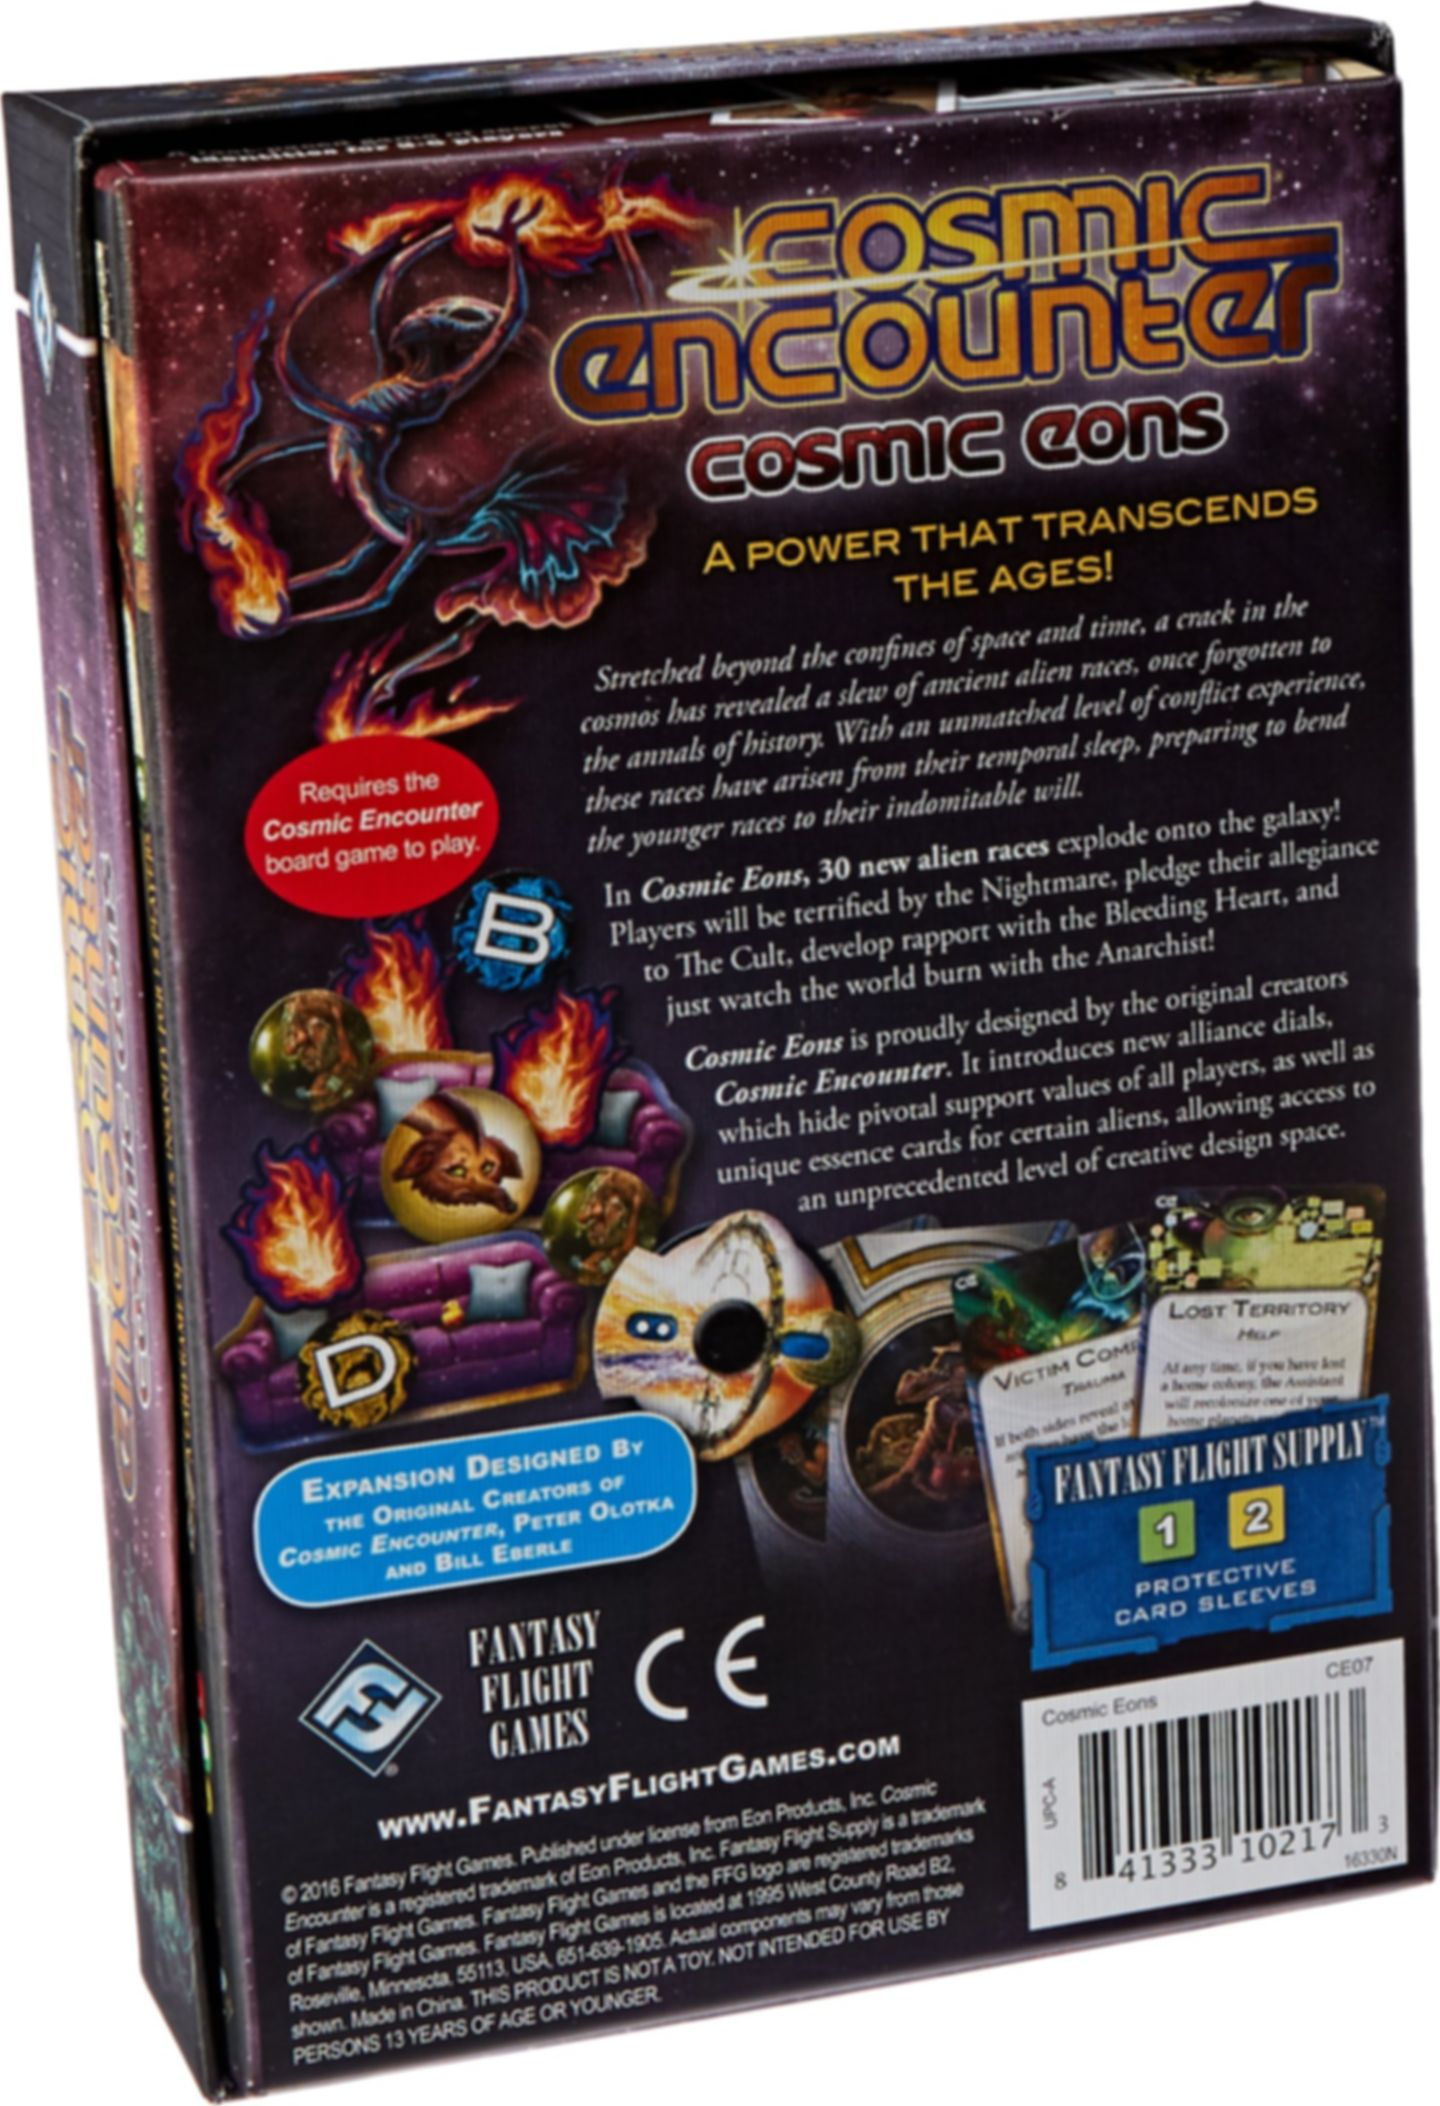 Cosmic Encounter: Cosmic Eons back of the box